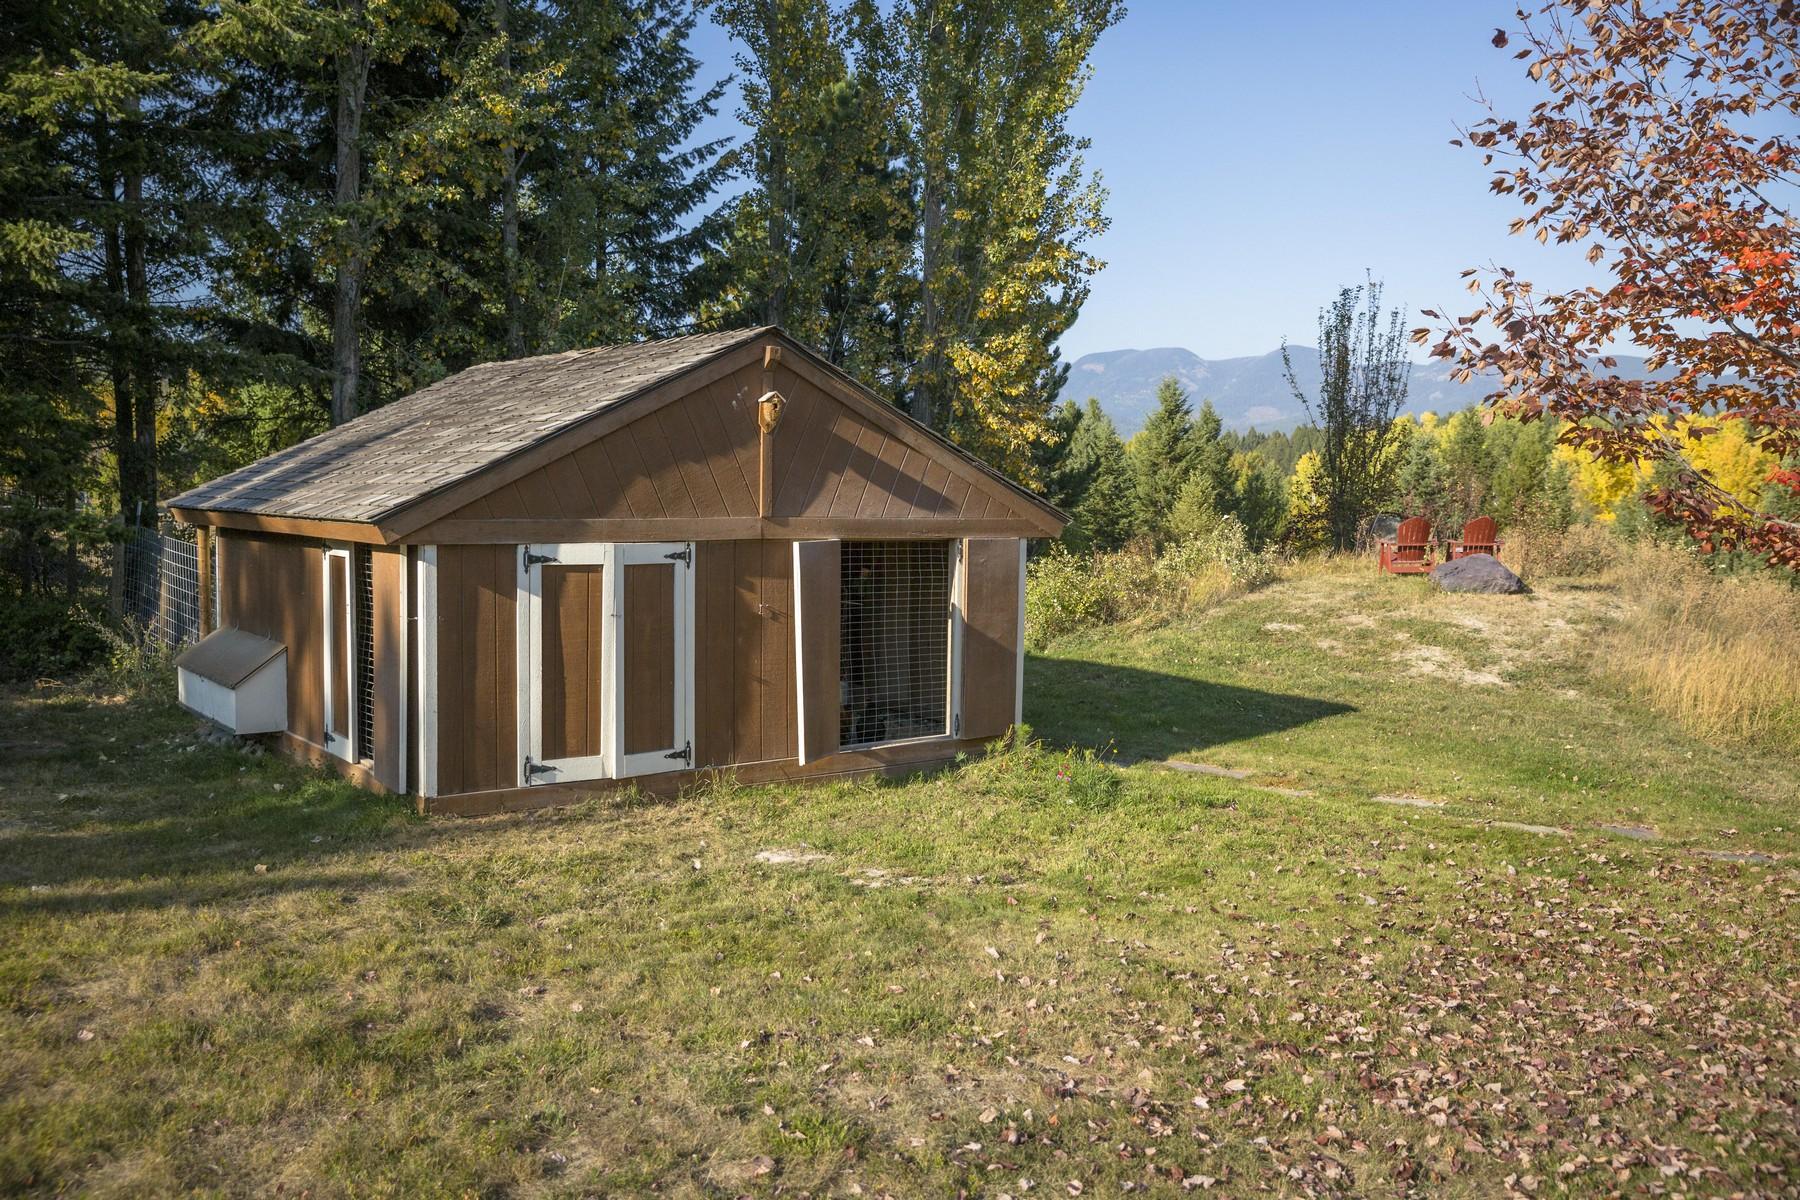 Additional photo for property listing at Blanchard Lake Sanctuary Nhn  Blanchard Lake Dr Whitefish, Montana 59937 United States